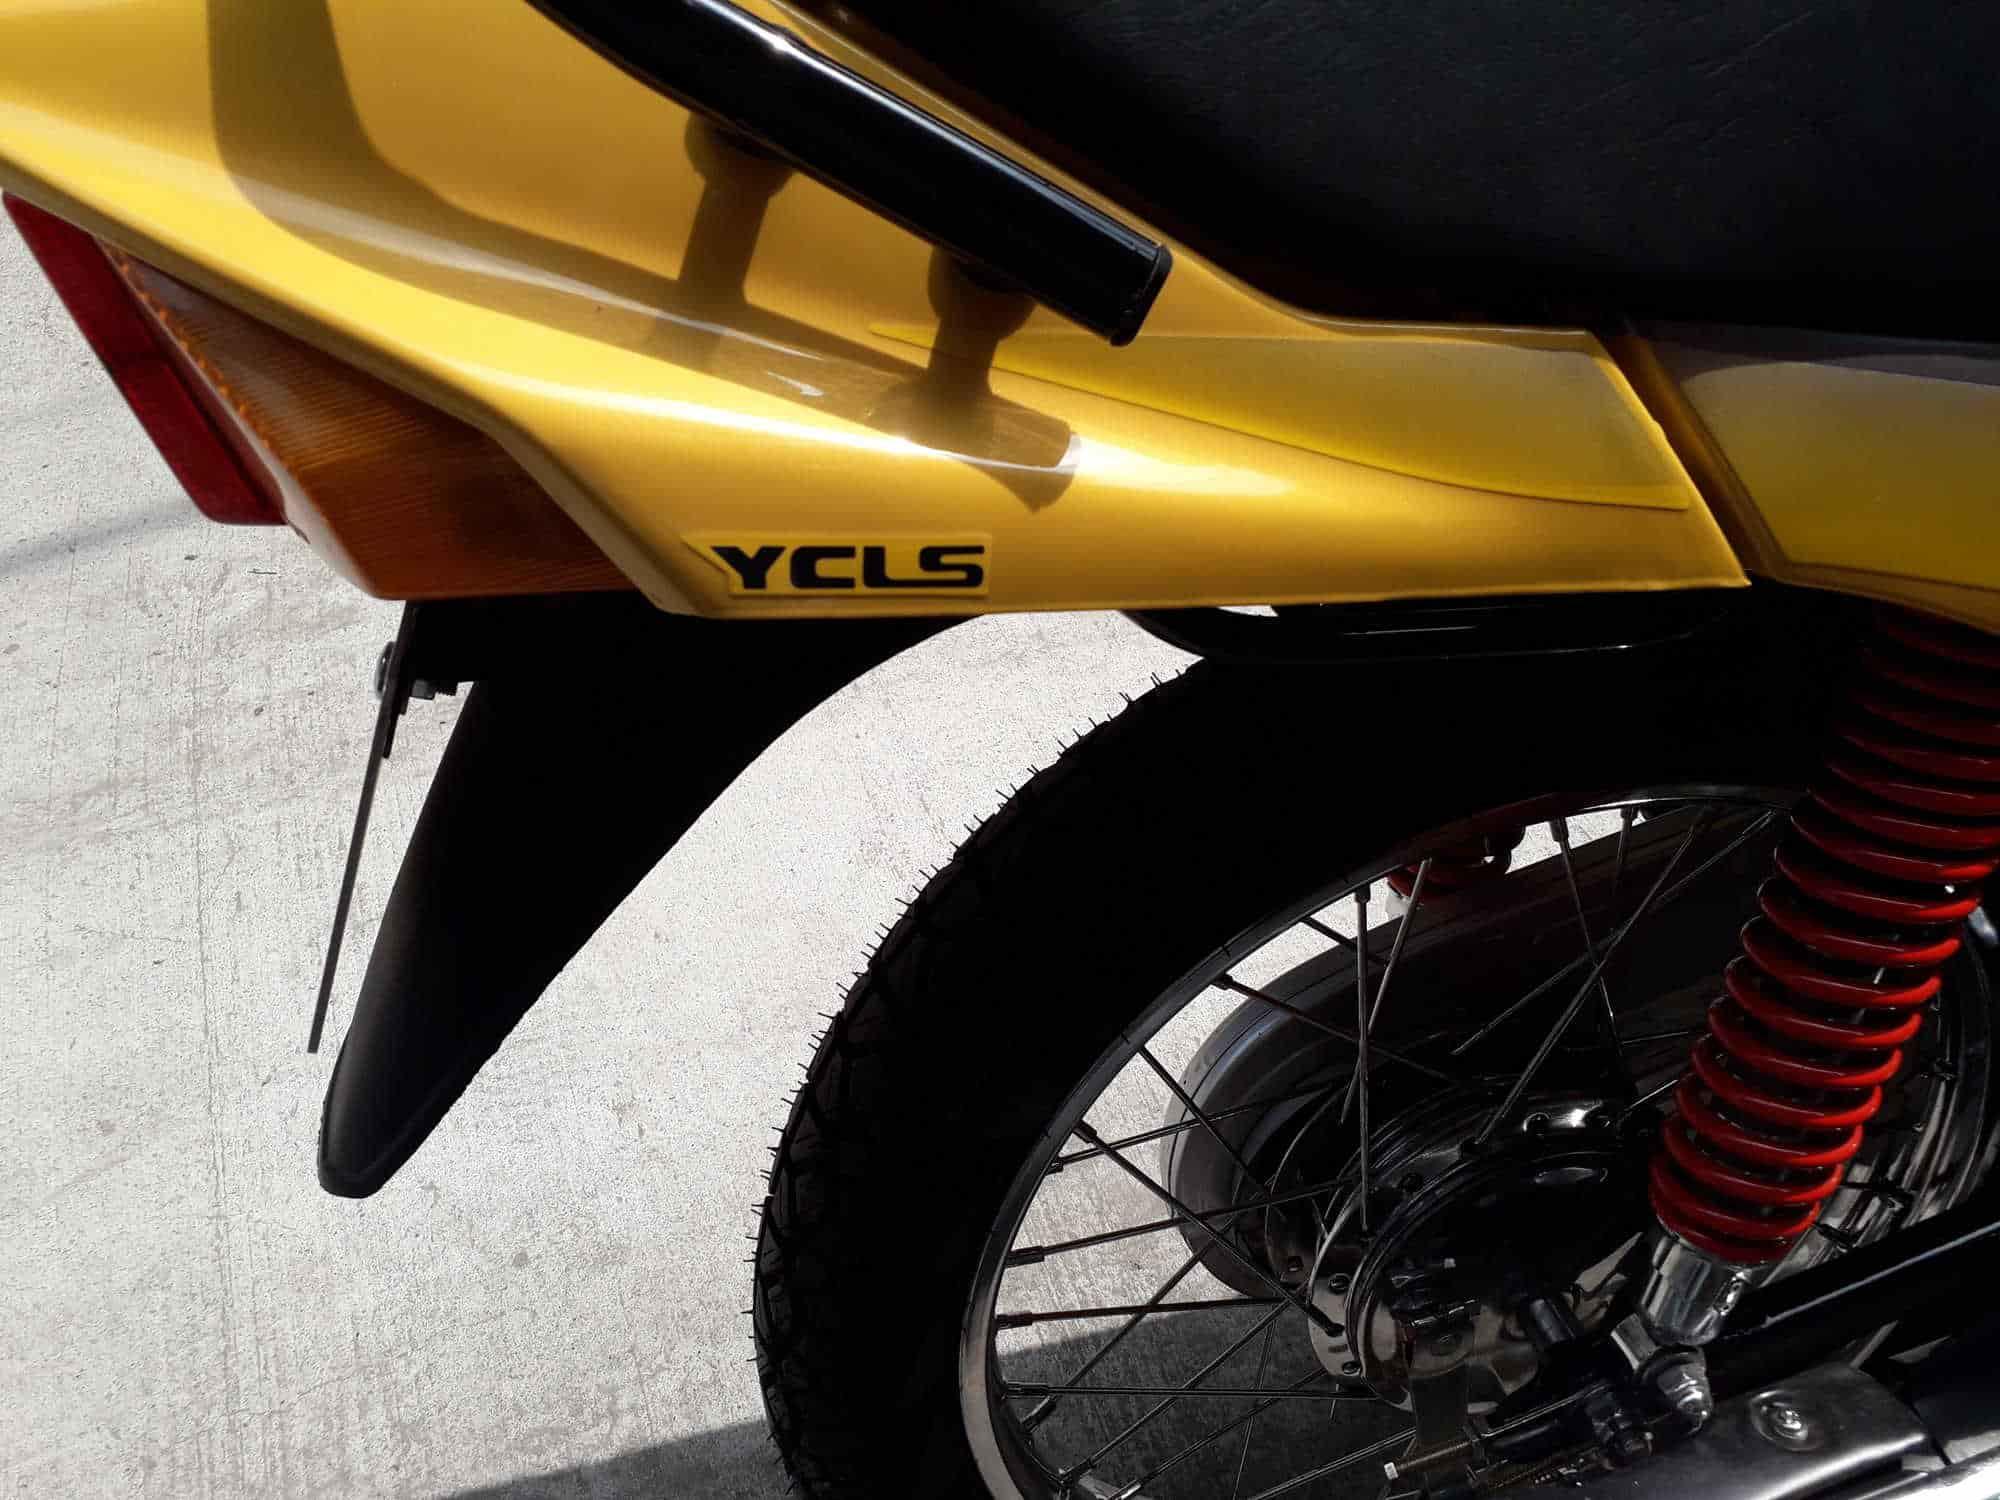 Classic Bikes, RS Puram - Motorcycle Repair & Services